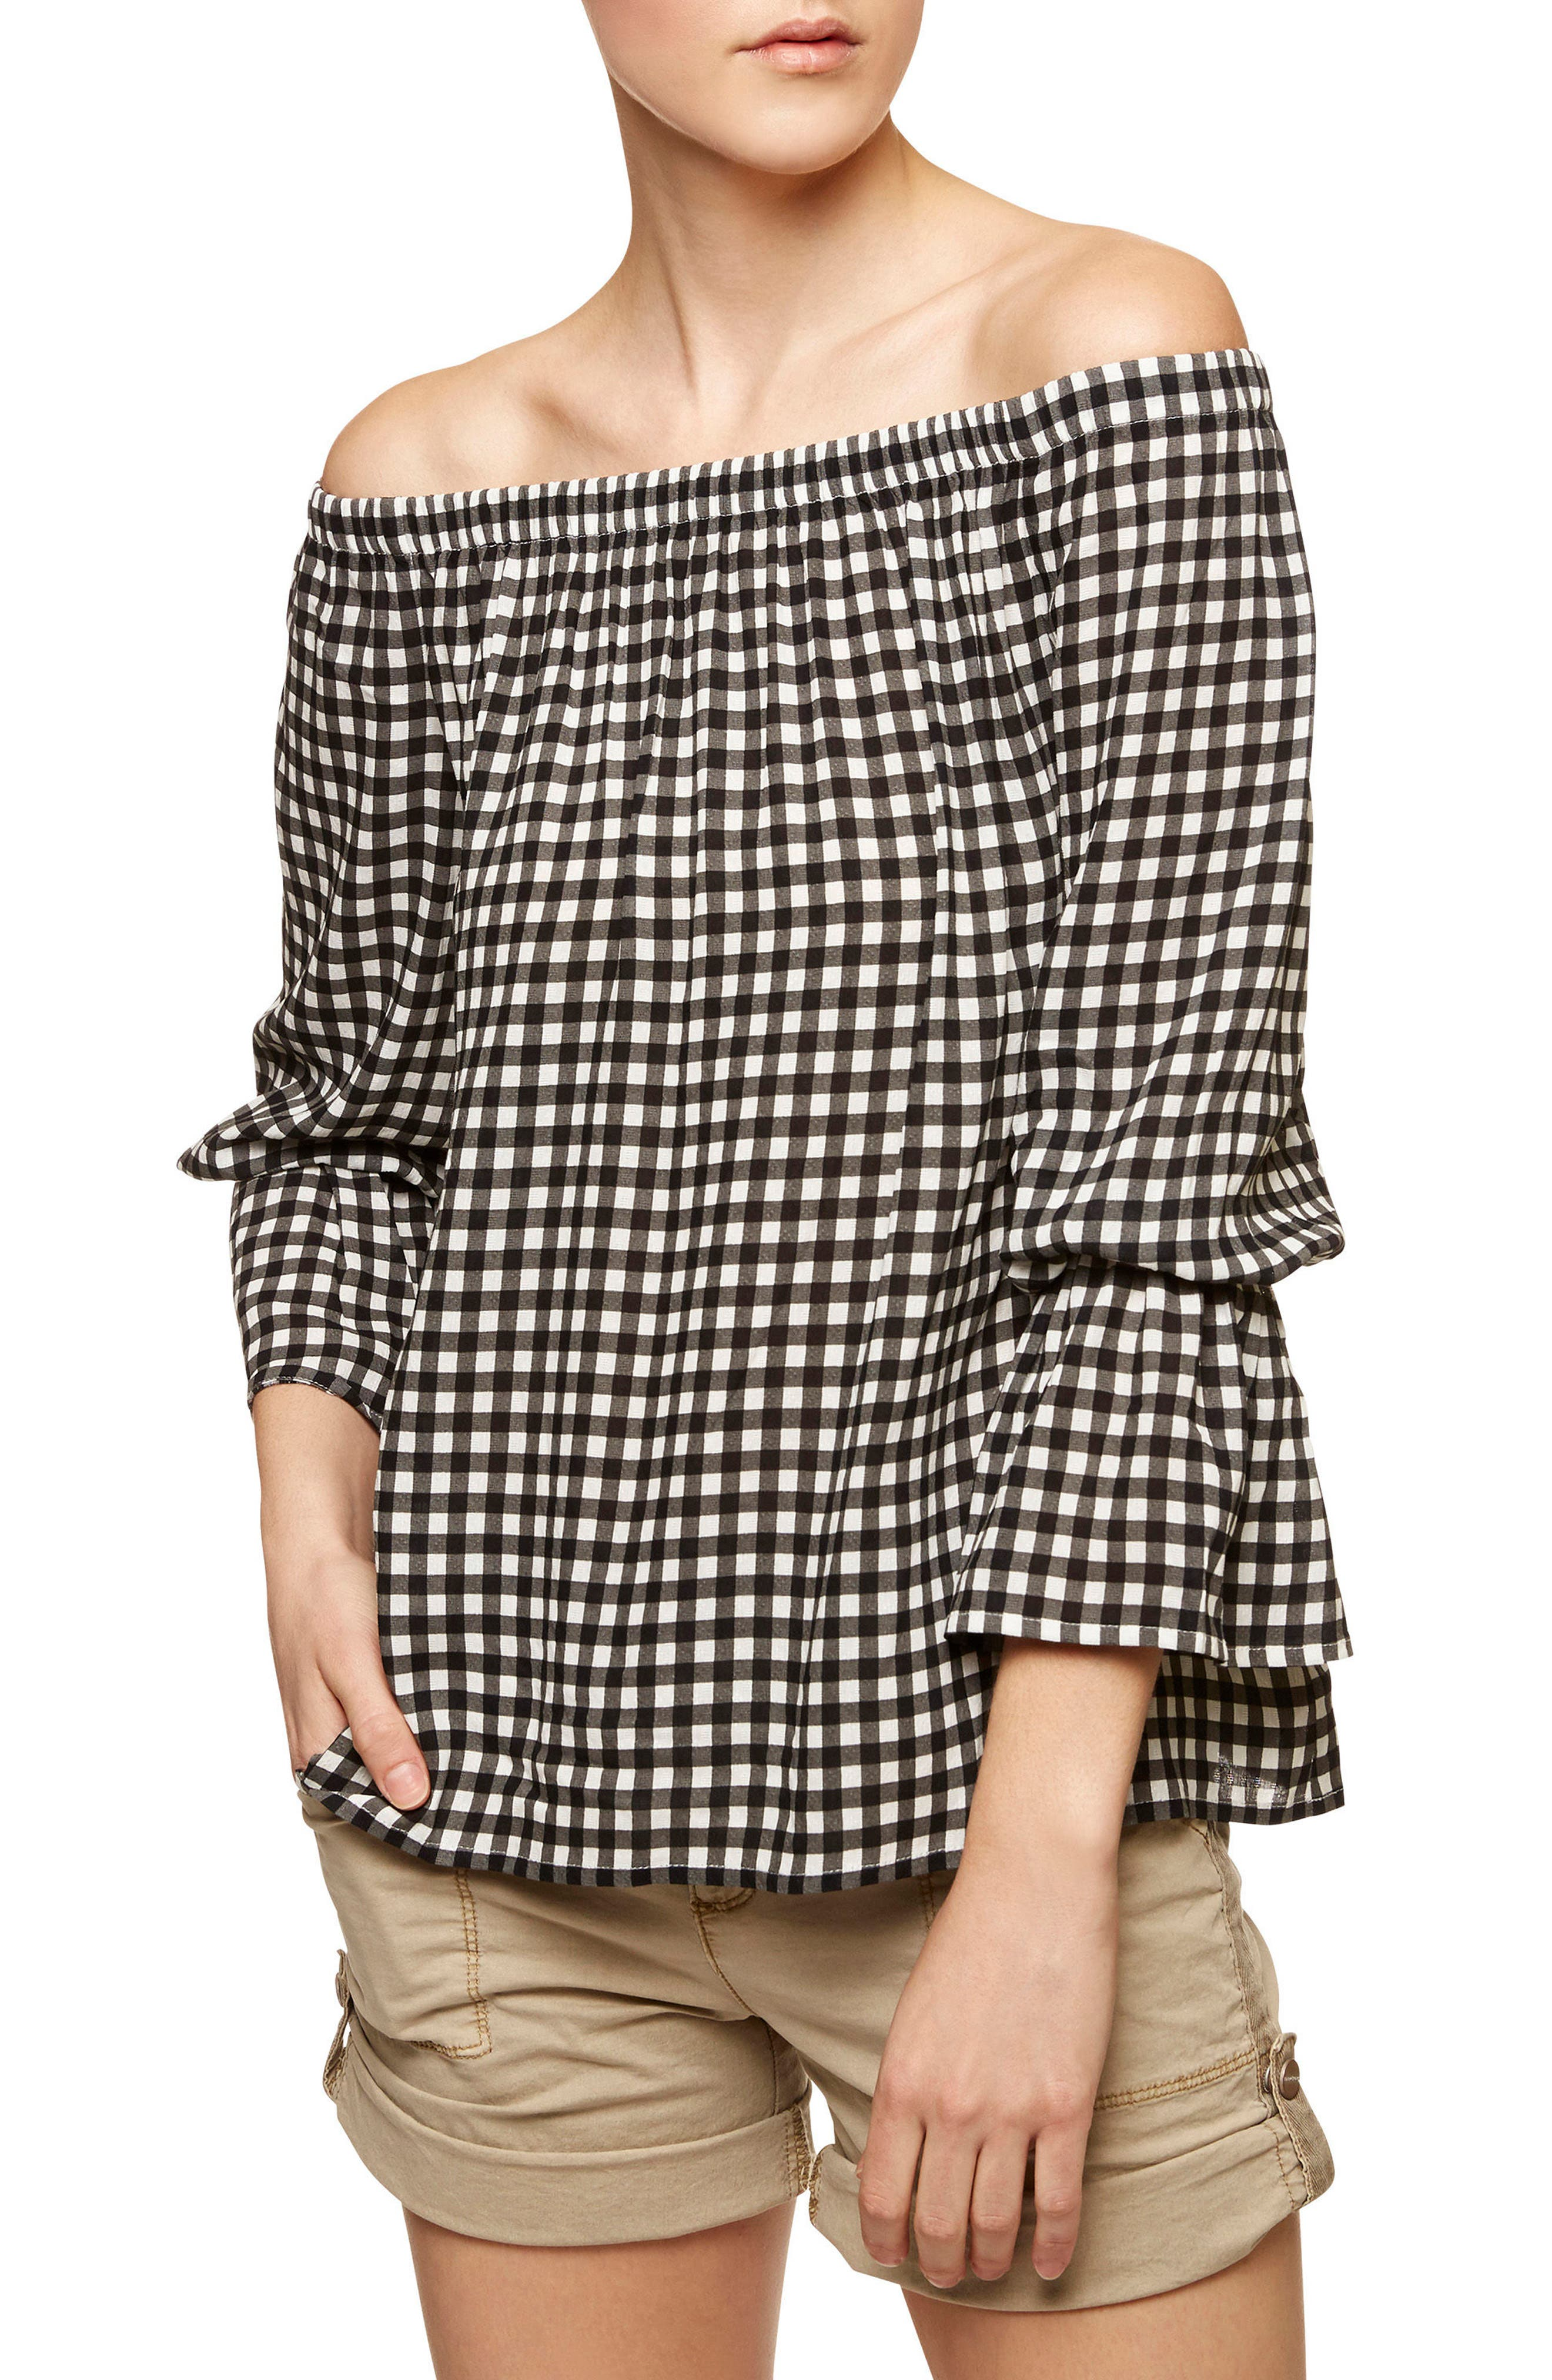 Off the Shoulder Blouse,                         Main,                         color, Black/ White